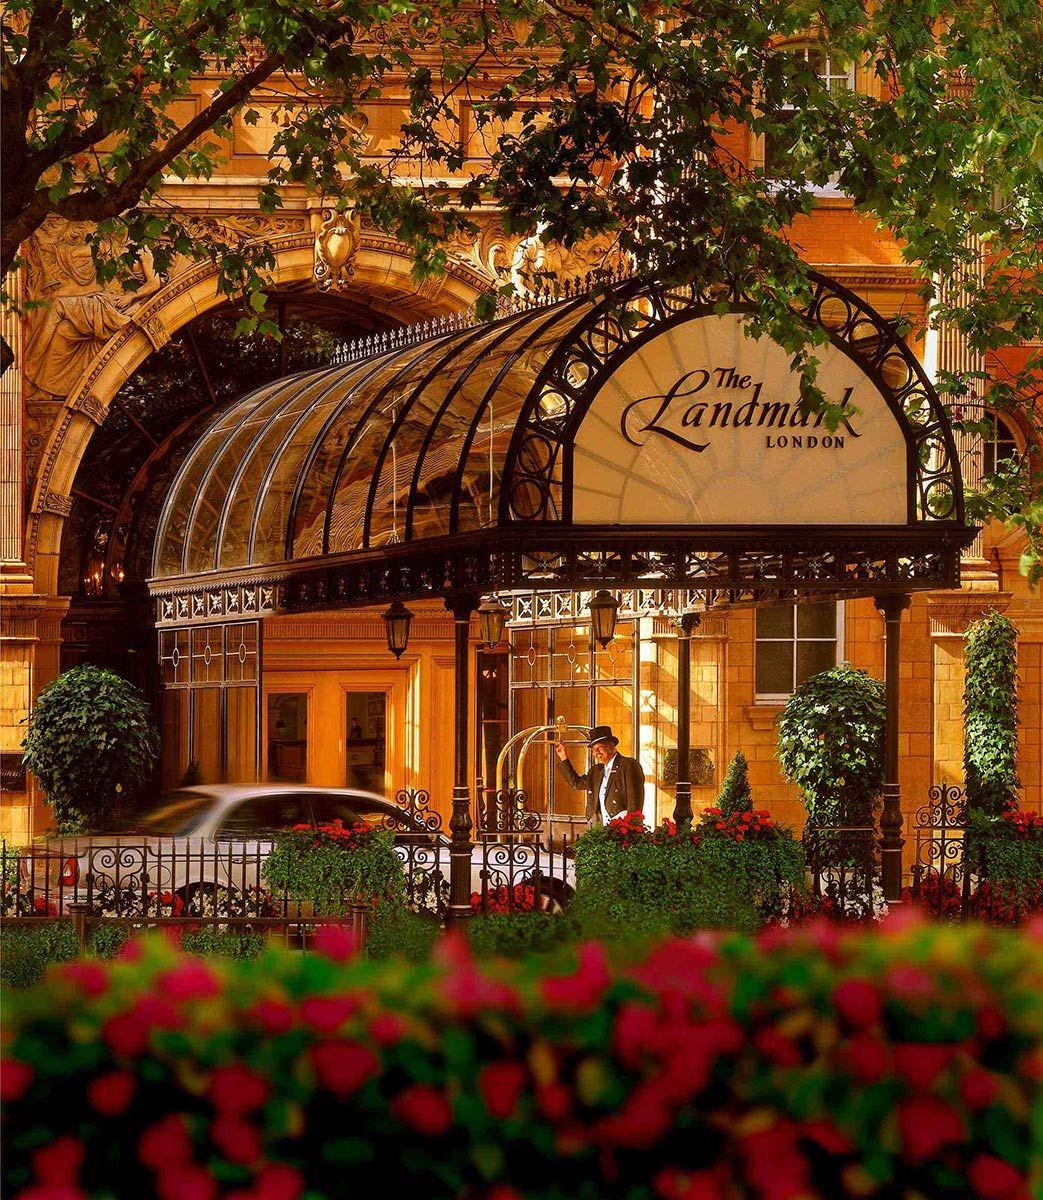 entrance of the 5 star landmark london hotel ゚ u0027゚ ℒσndon